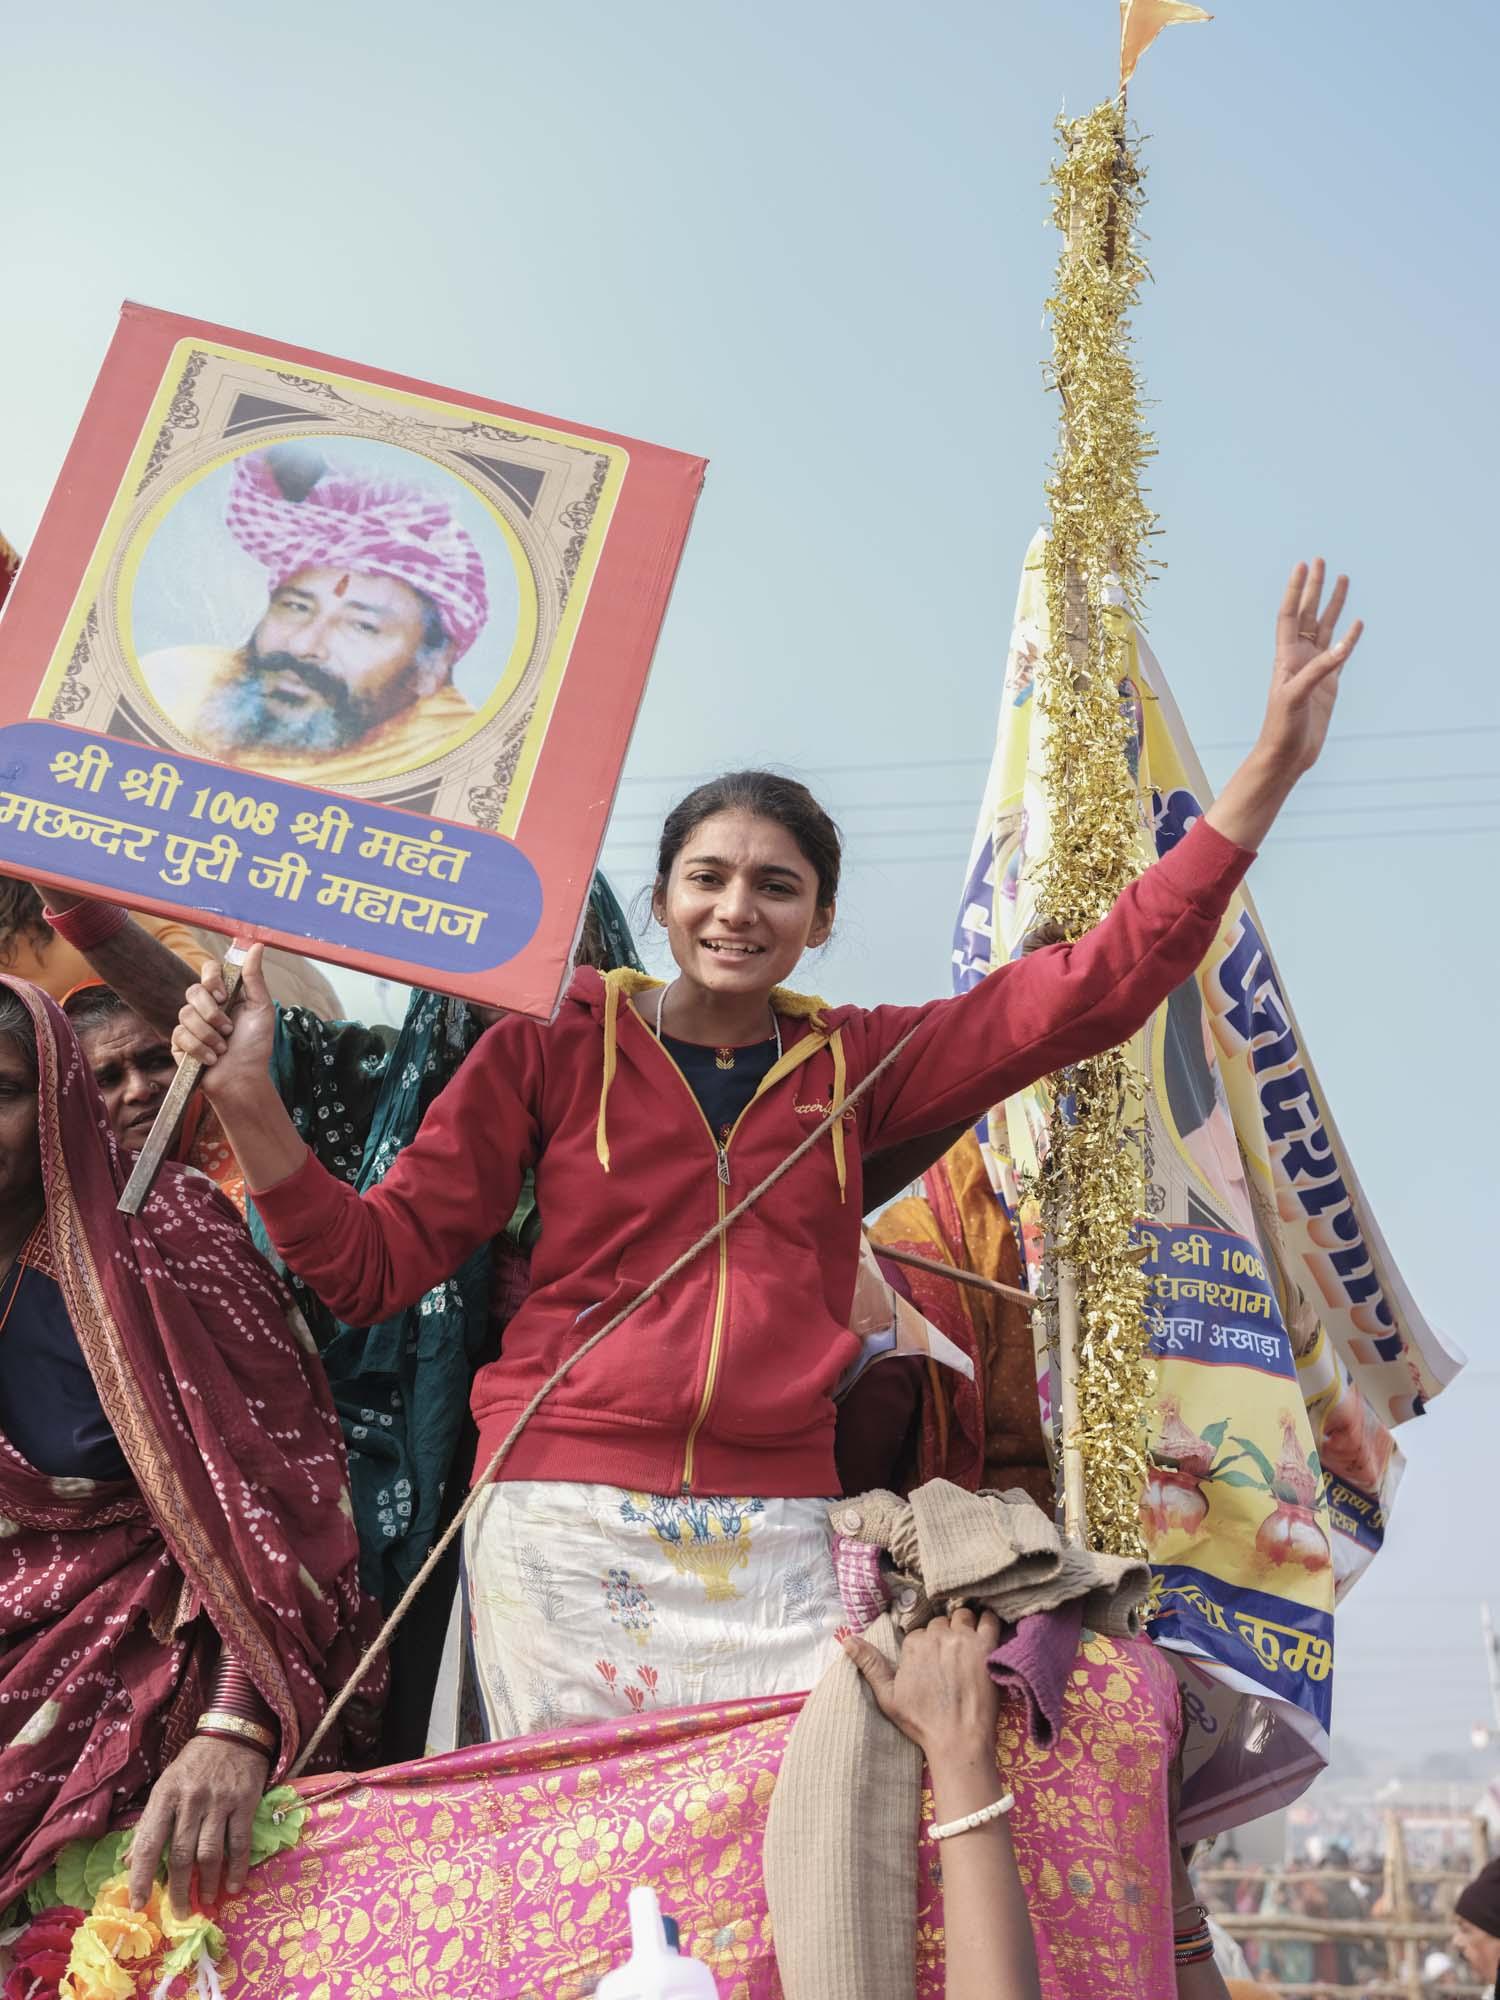 woman support baba crowd 4 February pilgrims Kumbh mela 2019 India Allahabad Prayagraj Ardh hindu religious Festival event rivers photographer jose jeuland photography